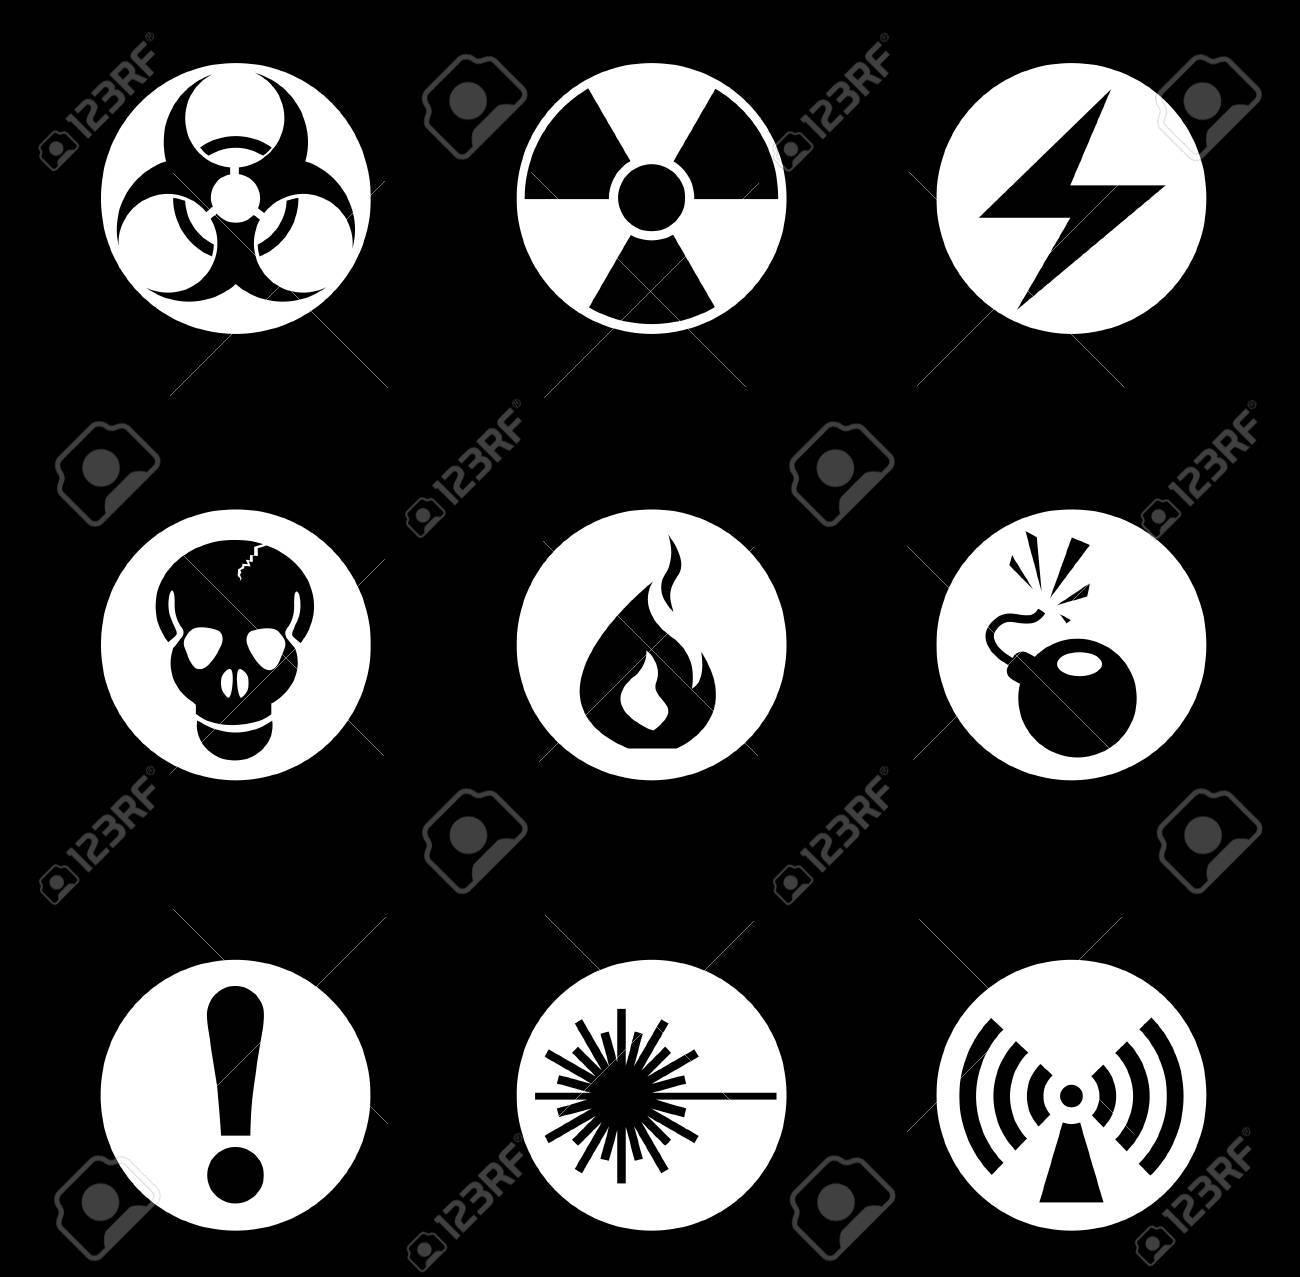 Hazard Sign Icons Stock Vector - 30135961